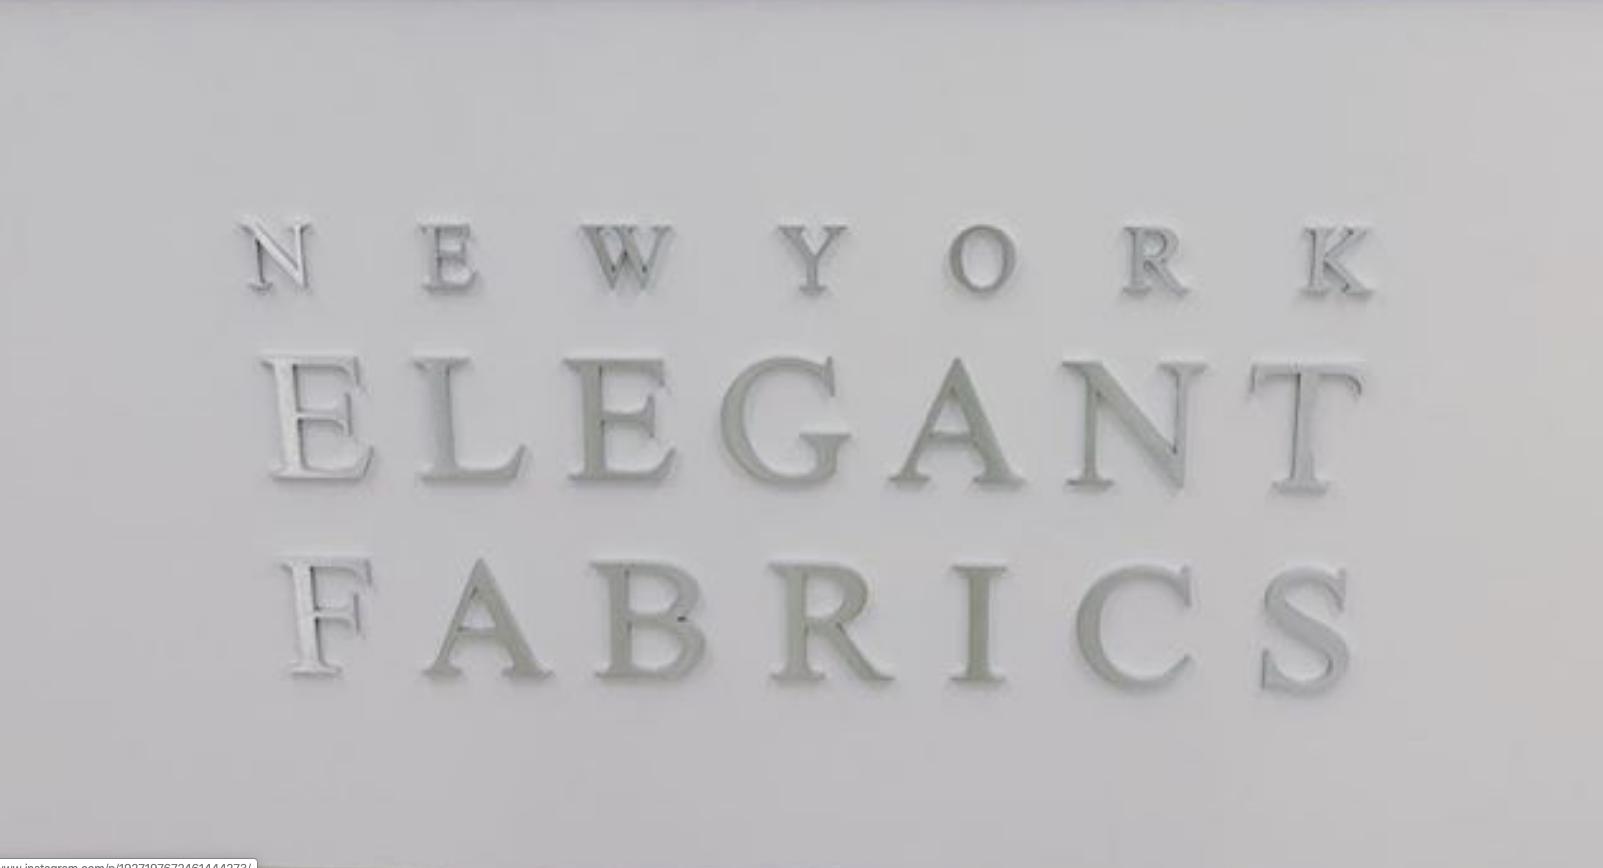 Elegant Fabrics